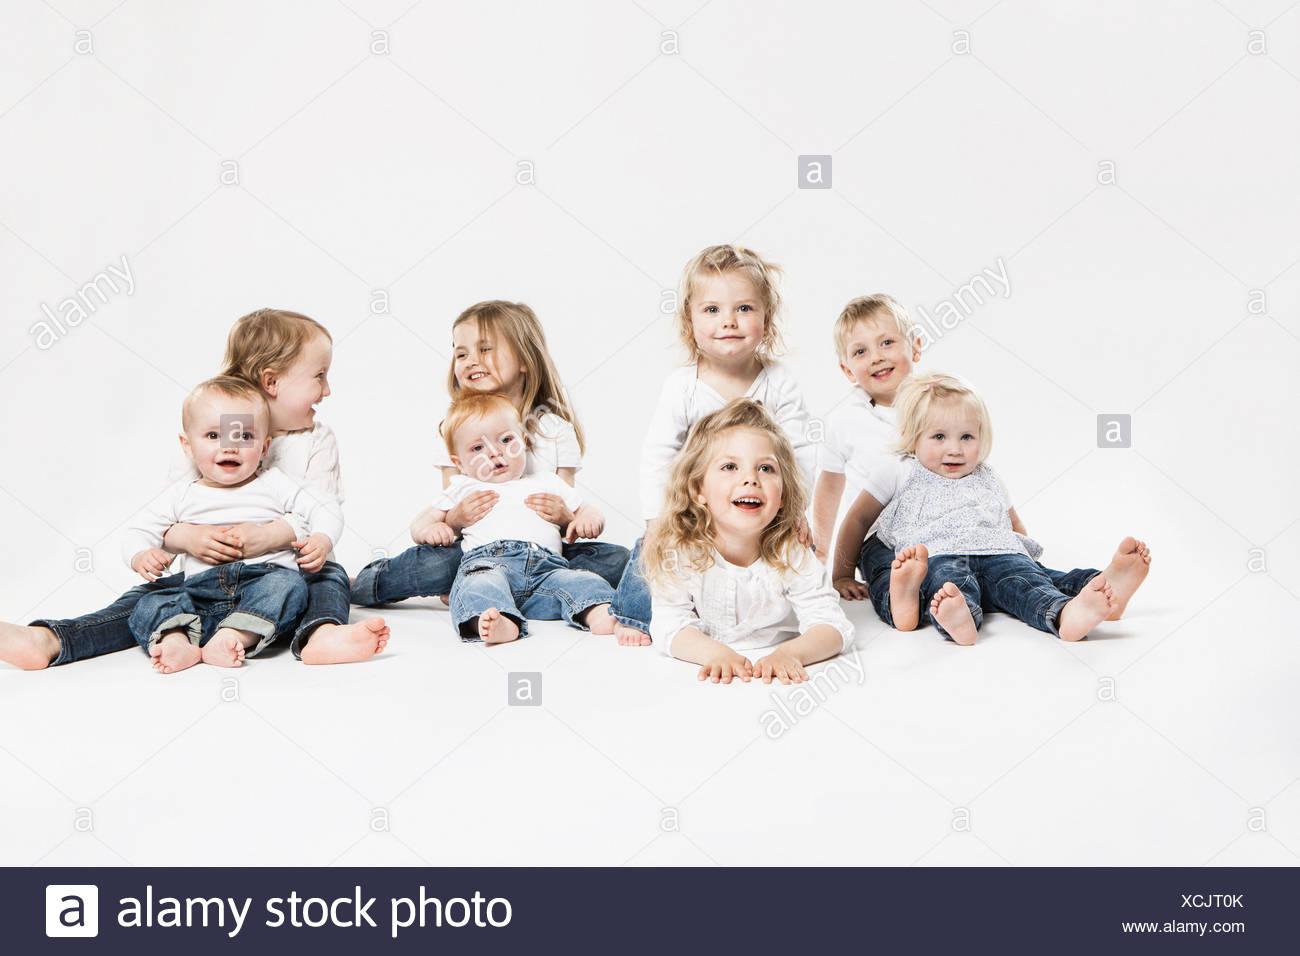 Smiling children posing together - Stock Image